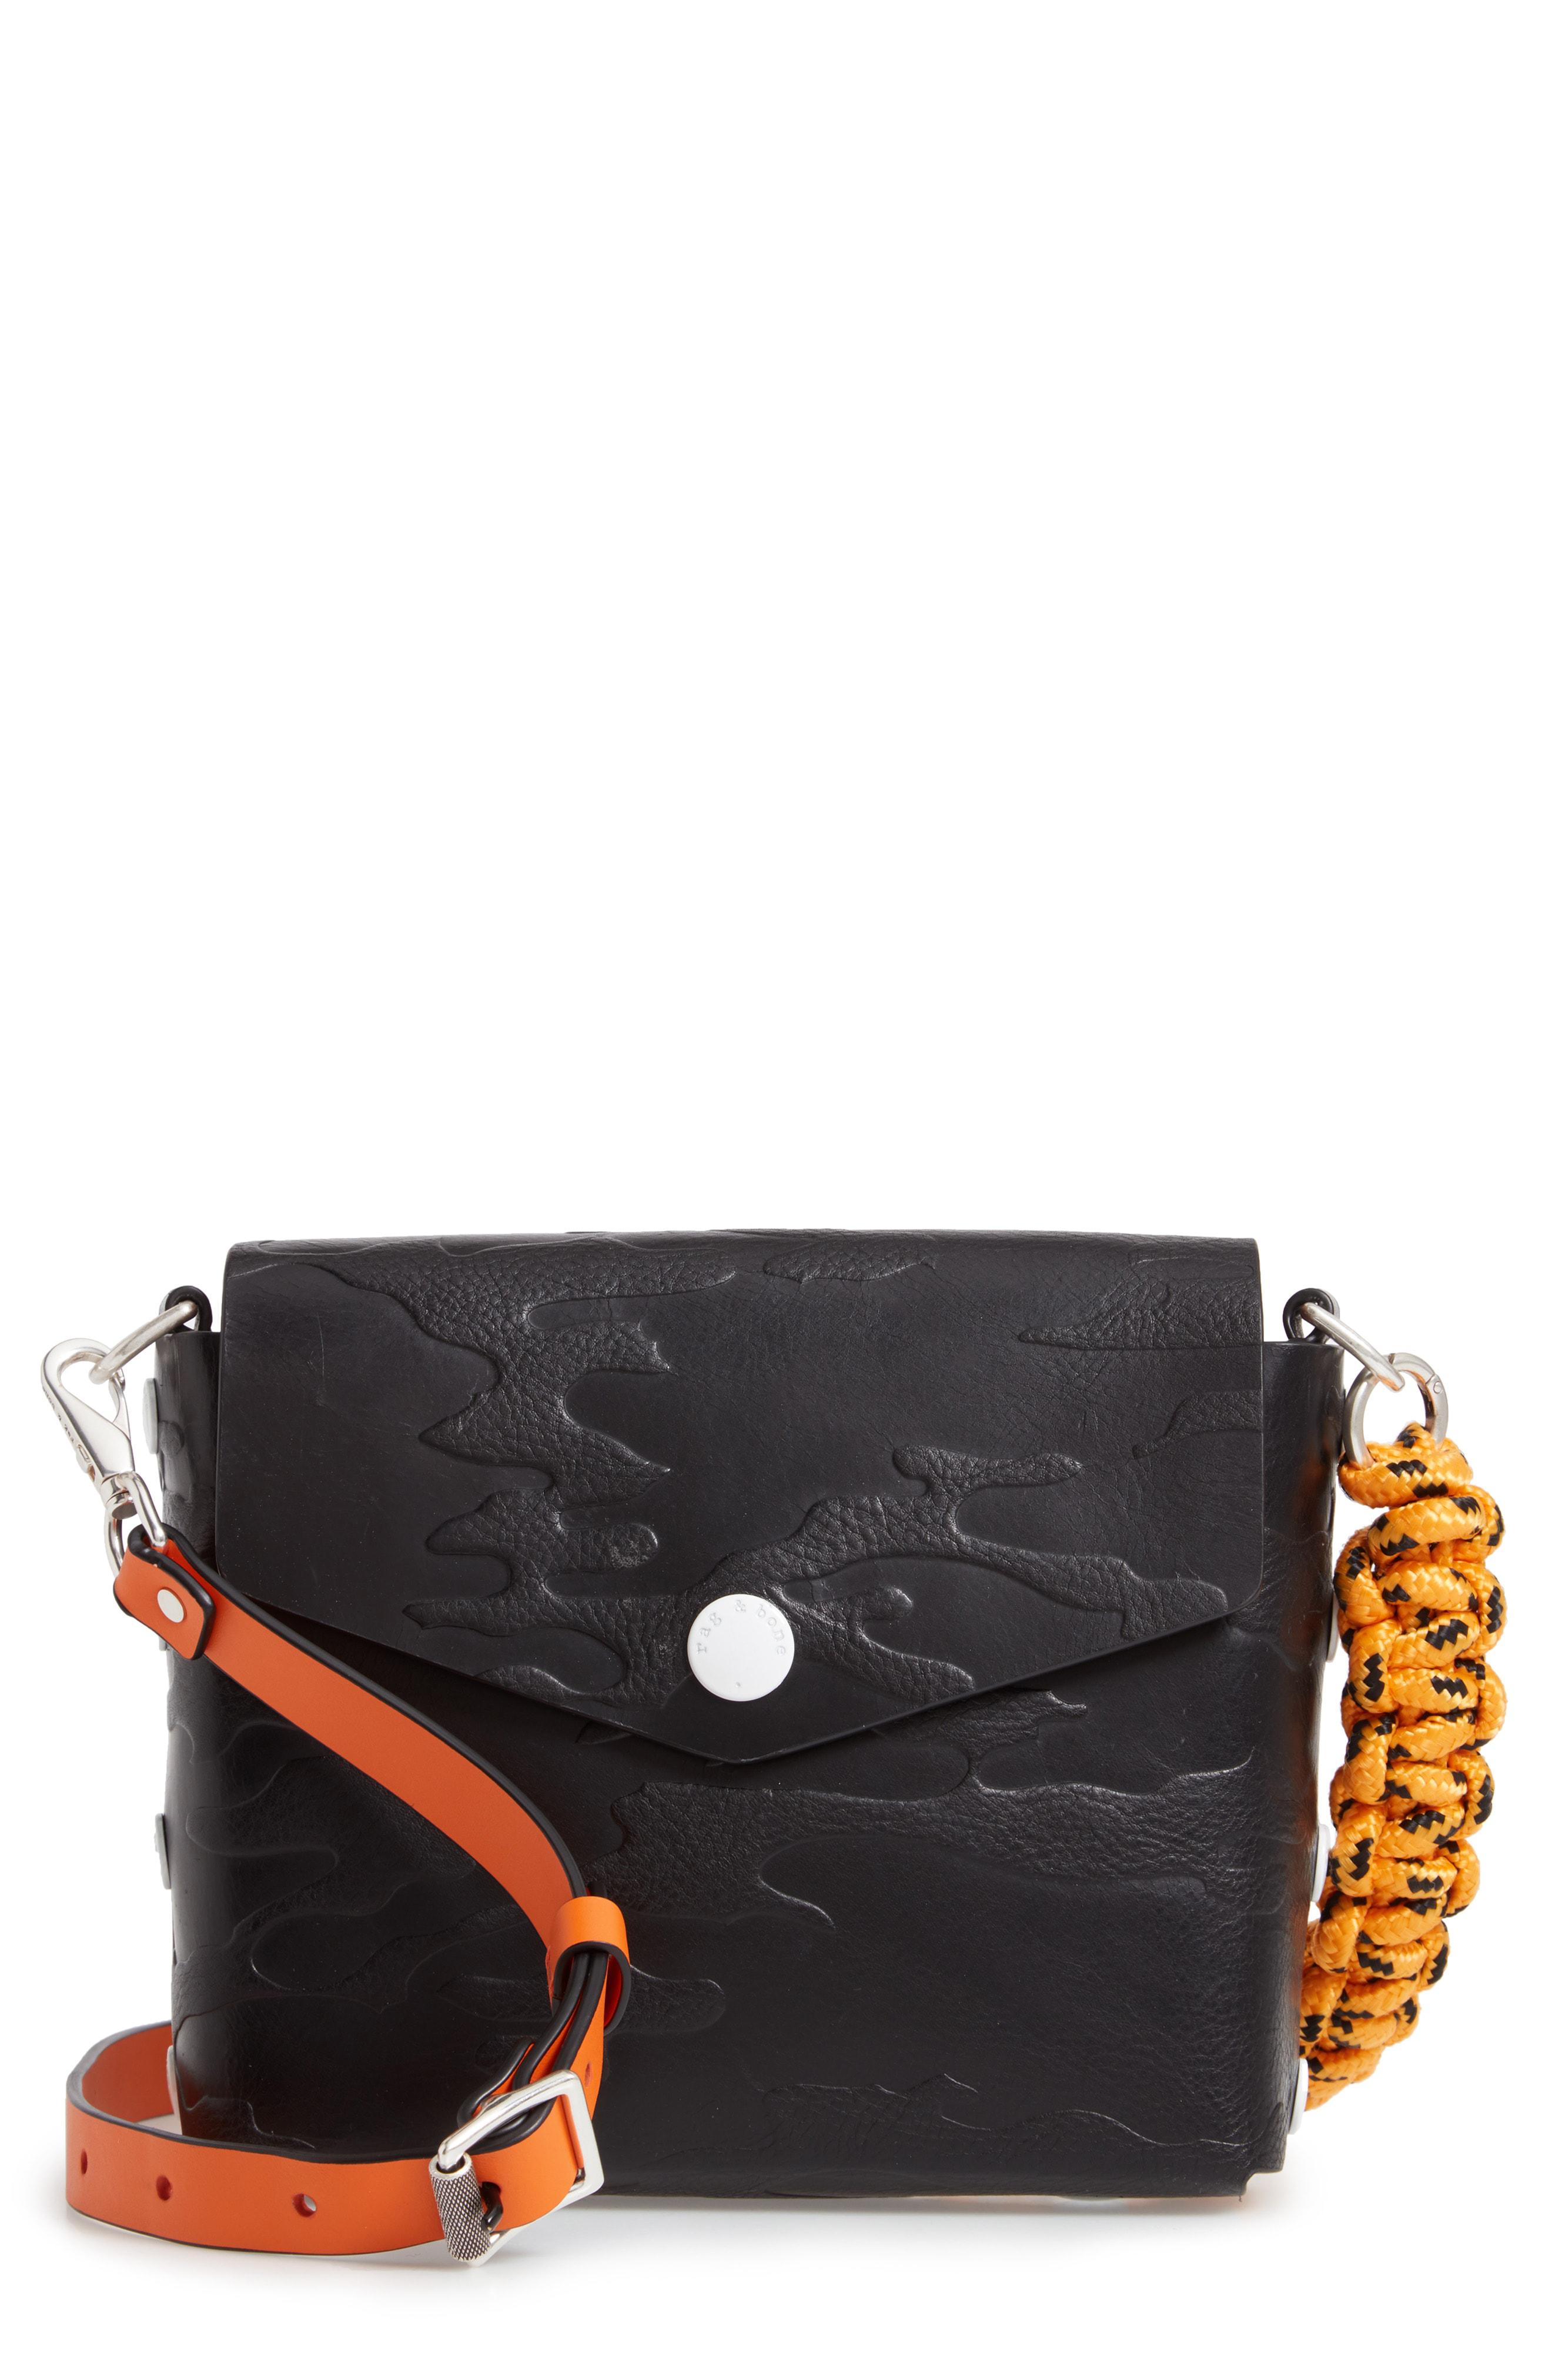 ea8d3cffd7 Rag   Bone Atlas Camo Embossed Leather Shoulder Bag - Black In Blkcamo